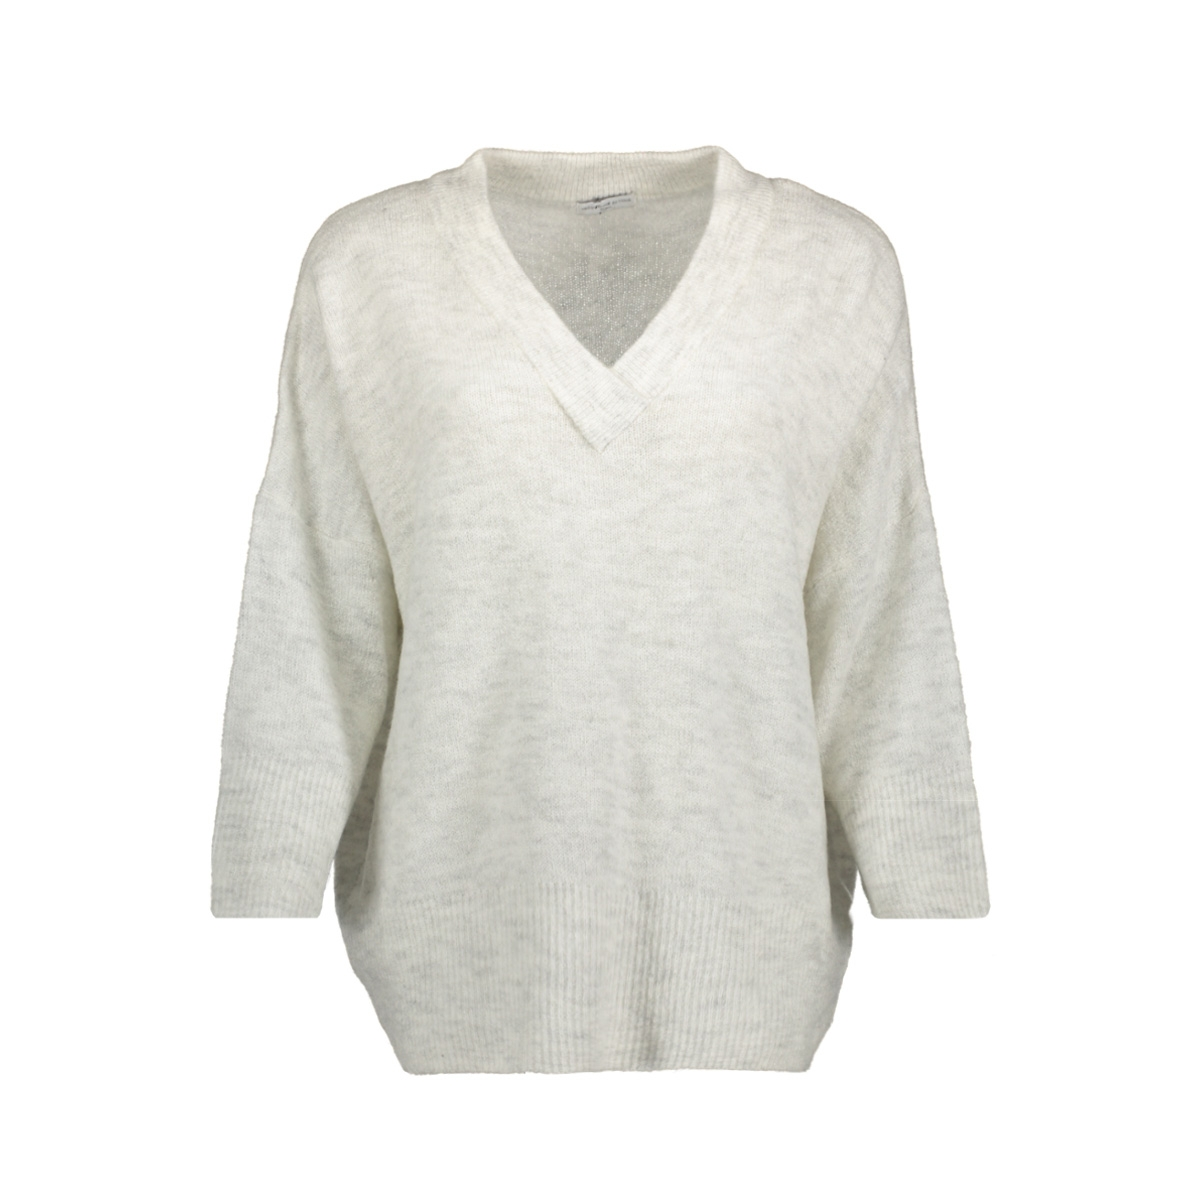 jdysoldier 3/4 v-neck pullover knt 15138663 jacqueline de yong trui white/melange